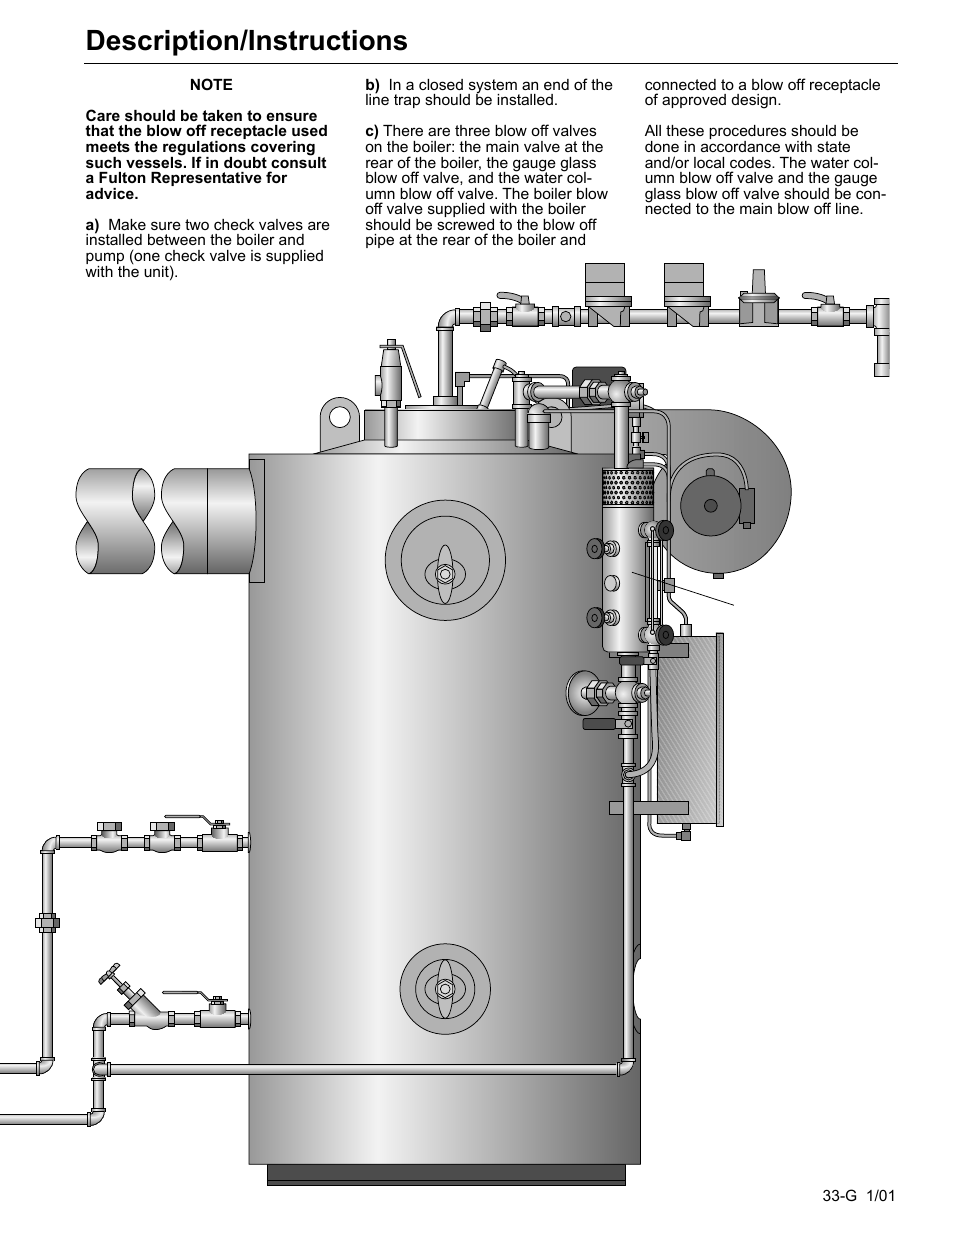 Gas fired steam boiler, Description/instructions | Fulton Edge ICX ...